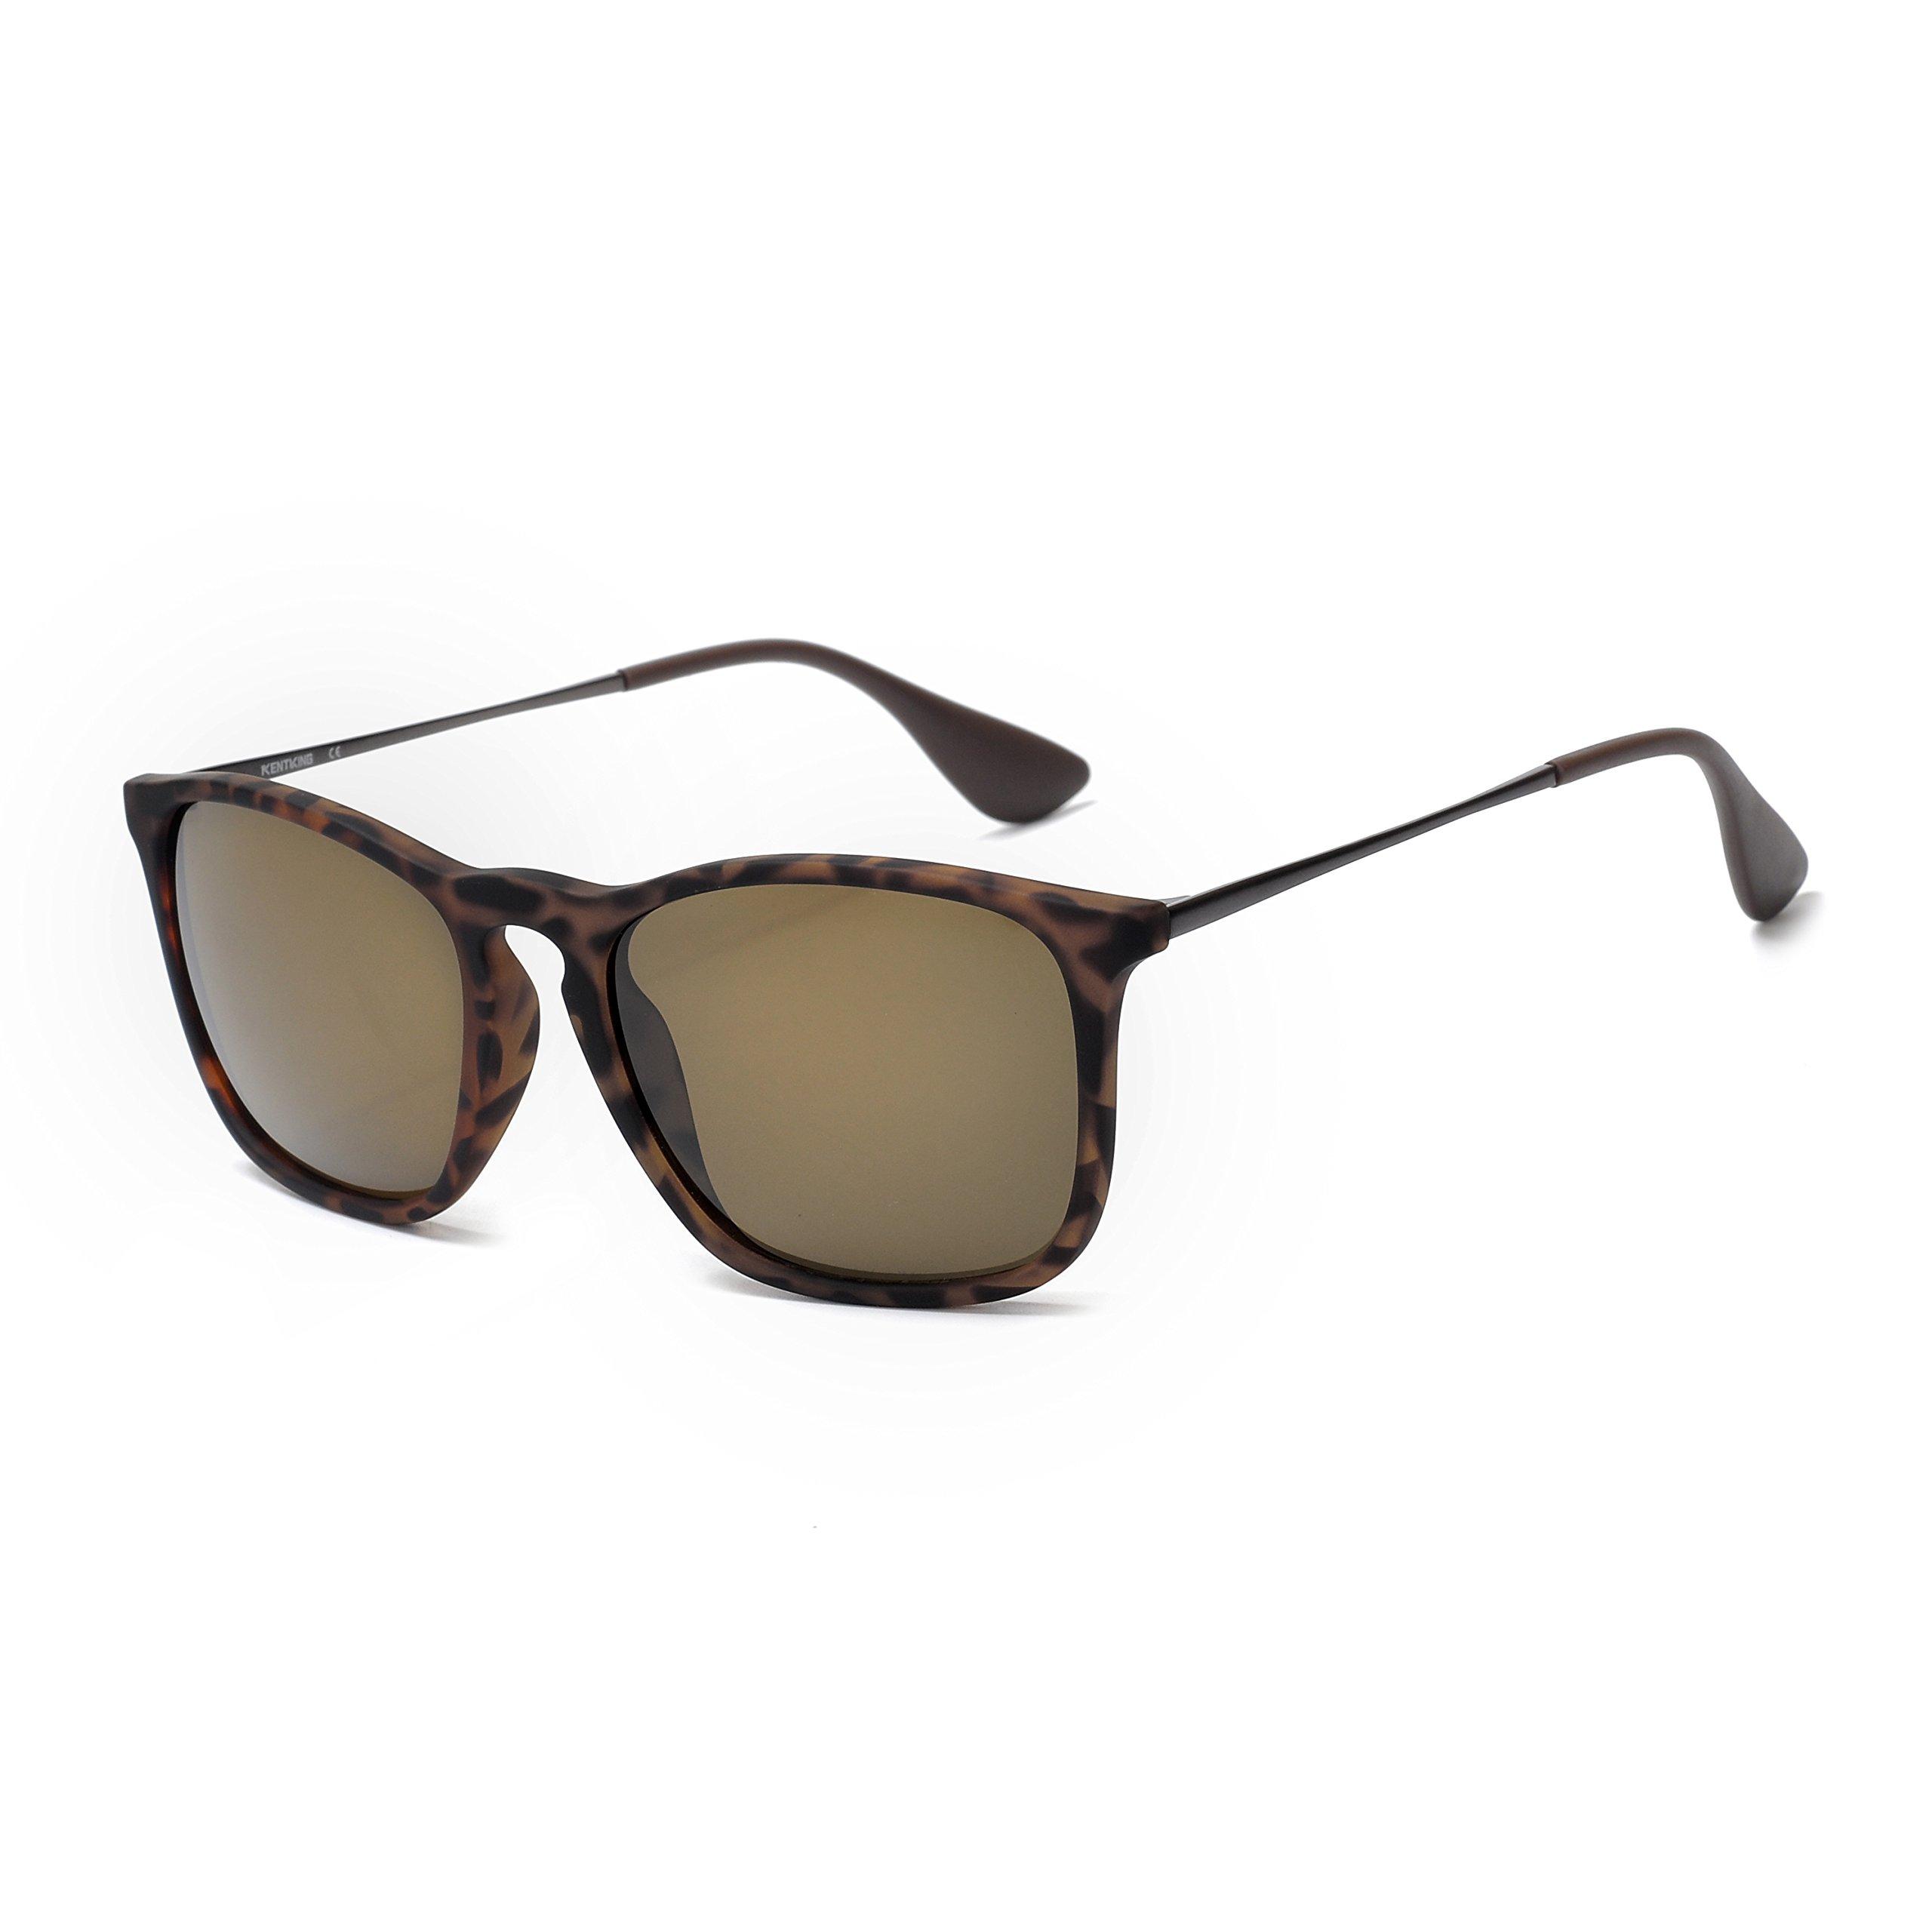 KENTKING Designer Wayfarer Square Sunglasses for Men - Seawater Erosion Resistant - Scratch Resistant - Nylon Lenses (Tortoise/Brown Lens)